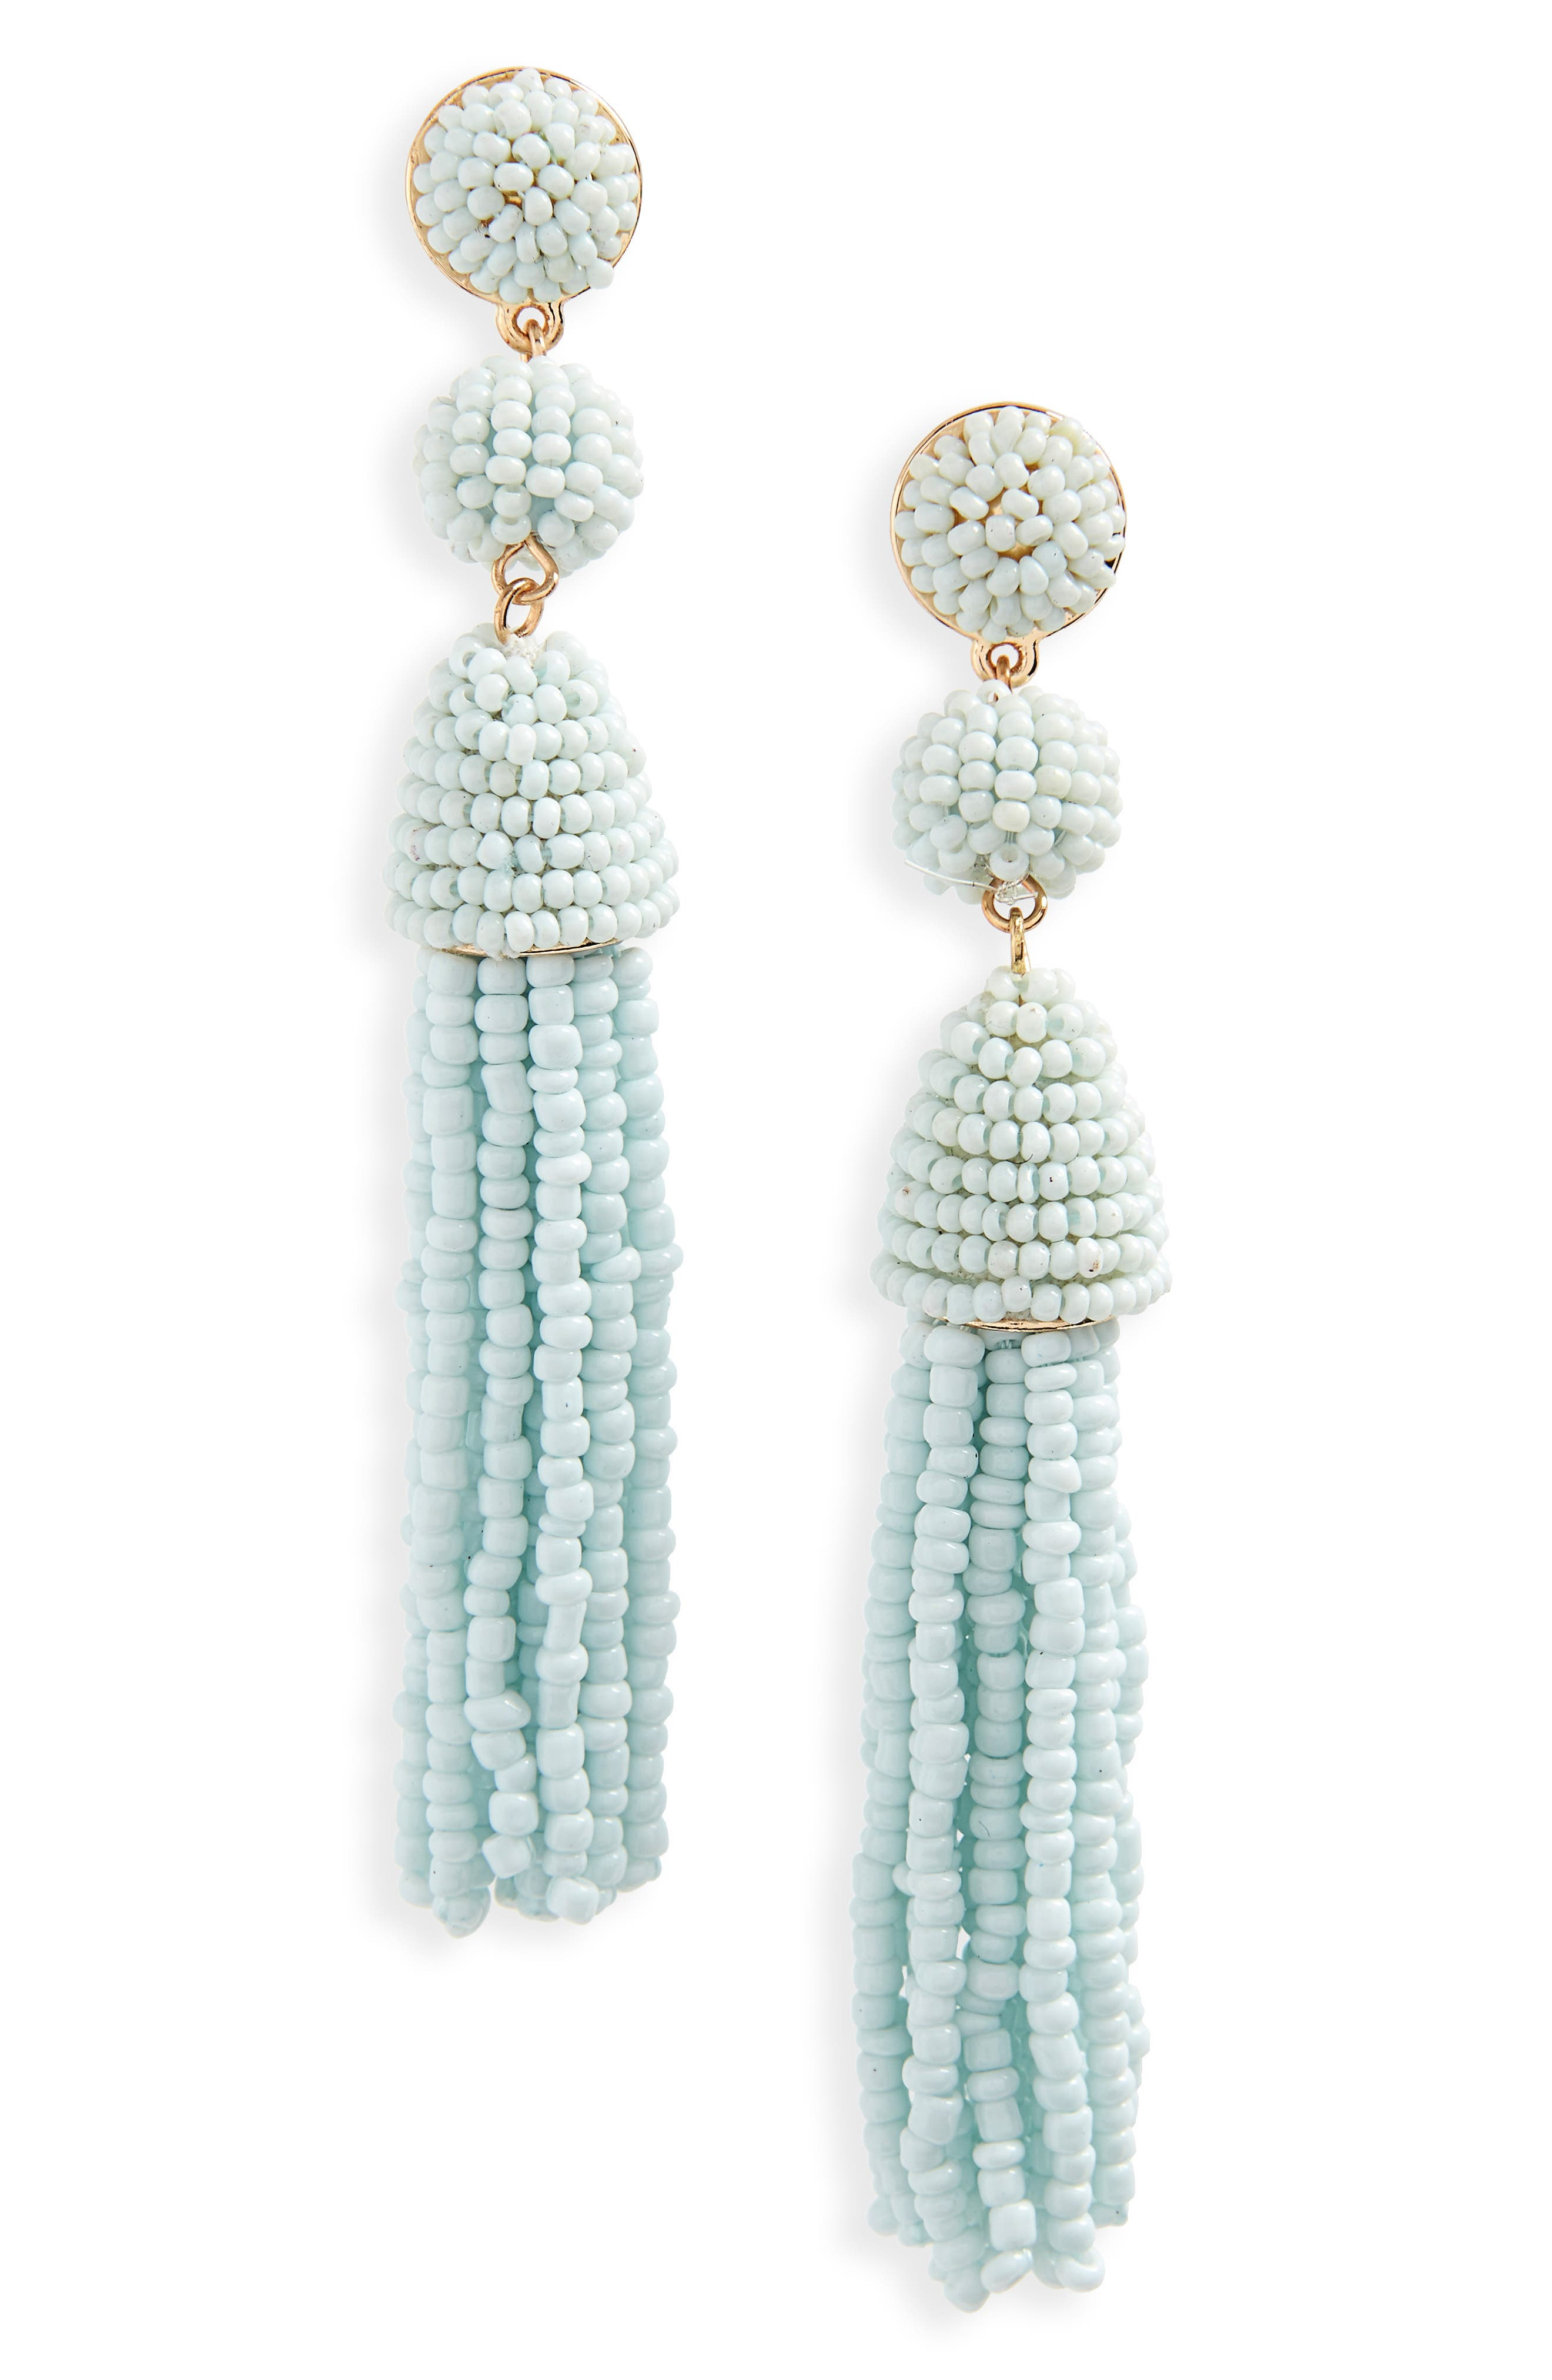 Alternate Image 1 Selected - BaubleBar Granita Beaded Tassel Earrings